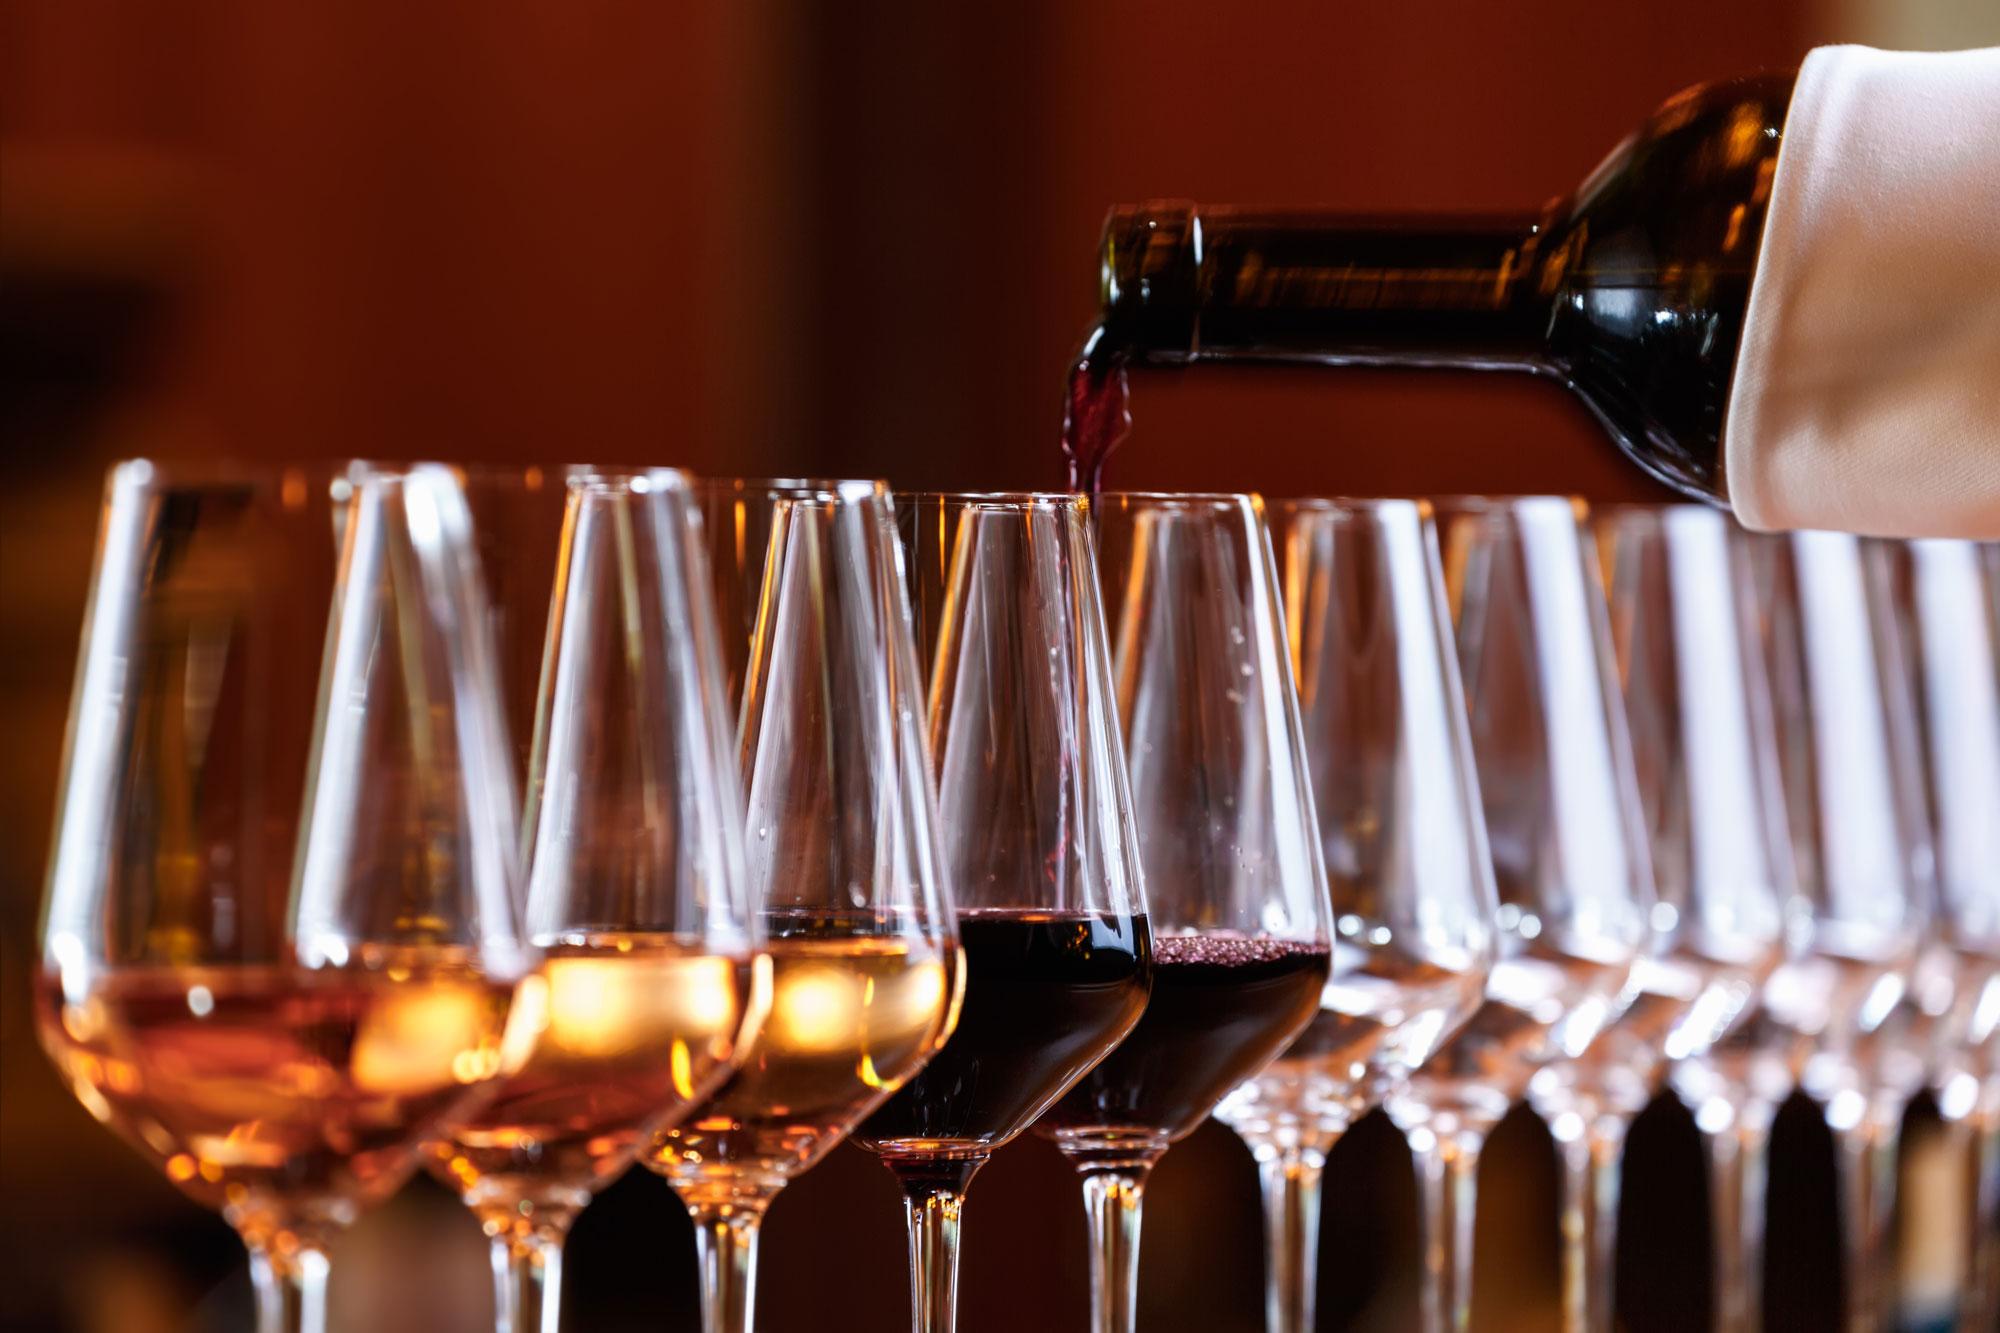 bigstock-Wine-Glasses-In-A-Row-Pouring-275011180web.jpg